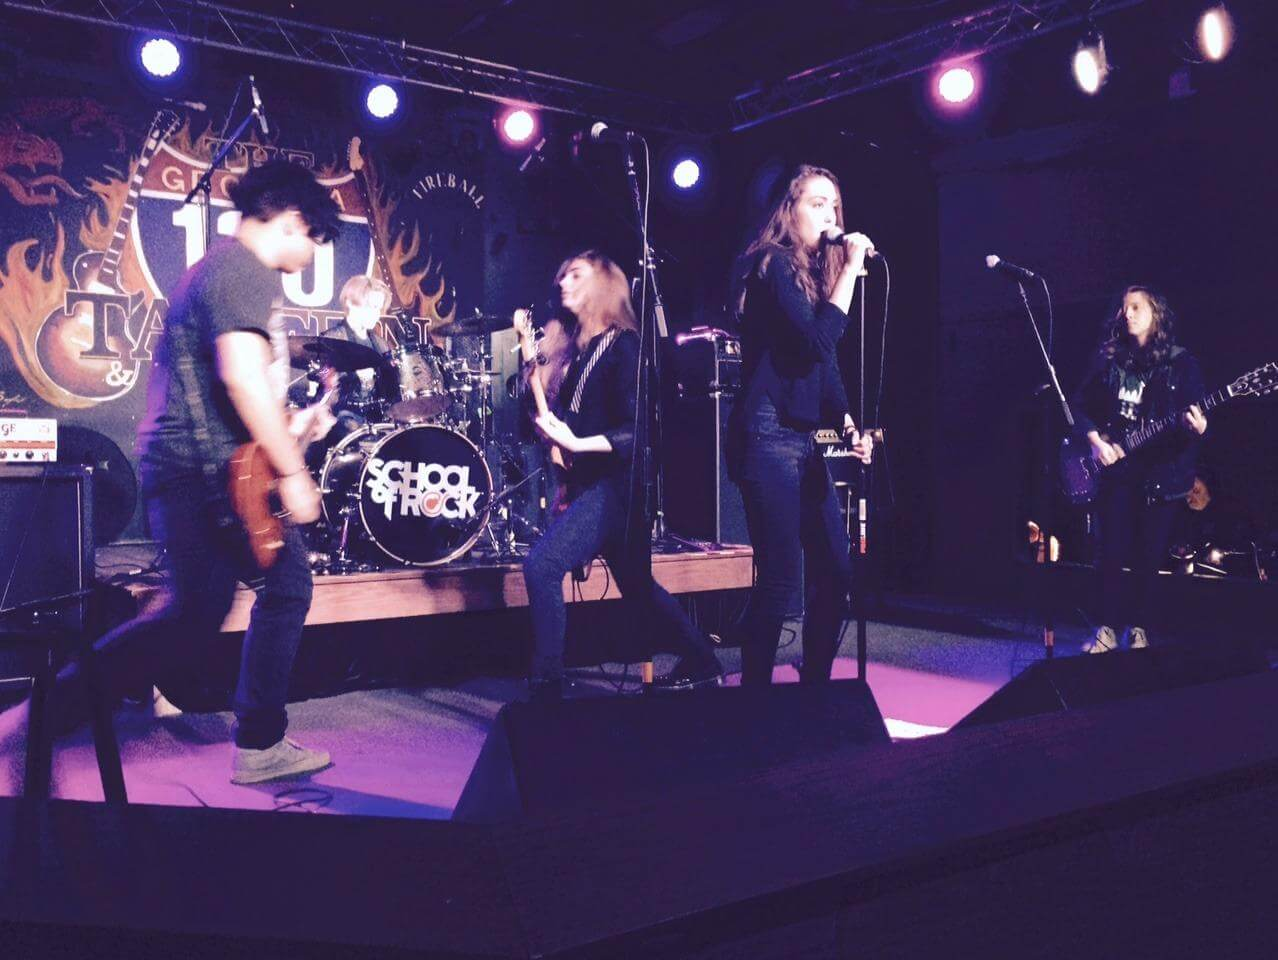 House Band Performance, Dec 2015.